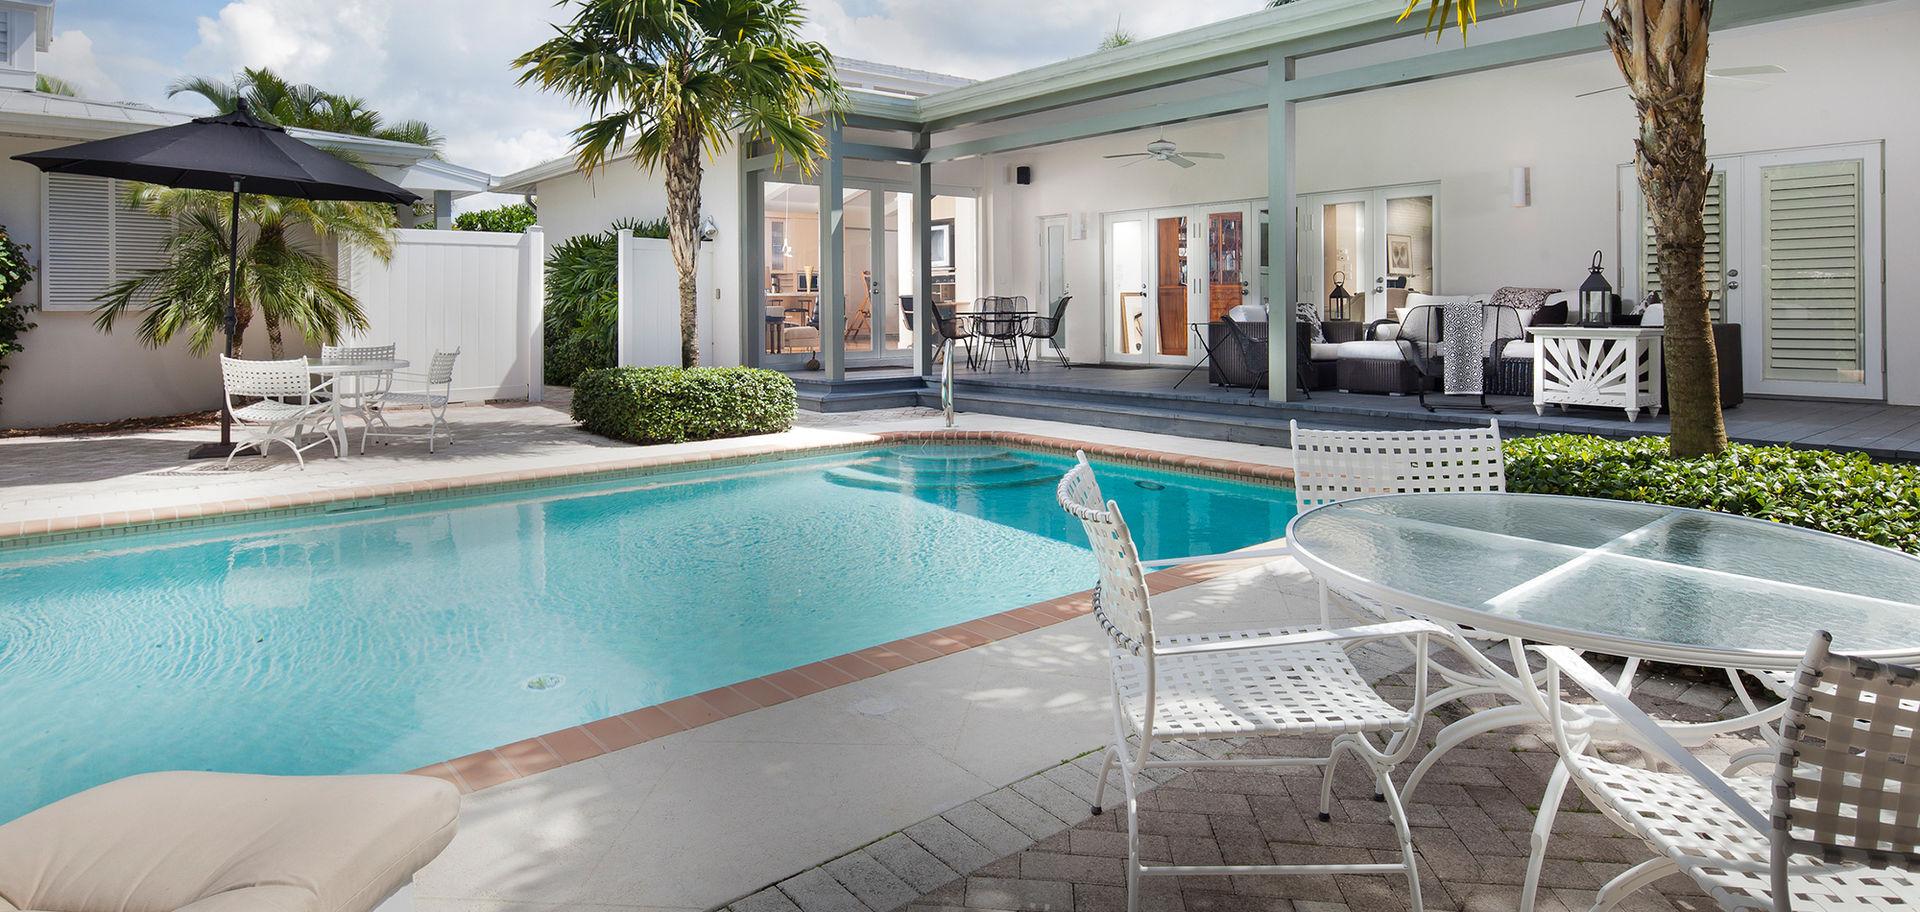 Naples Florida Real Estate   Naples Florida Homes for Sale